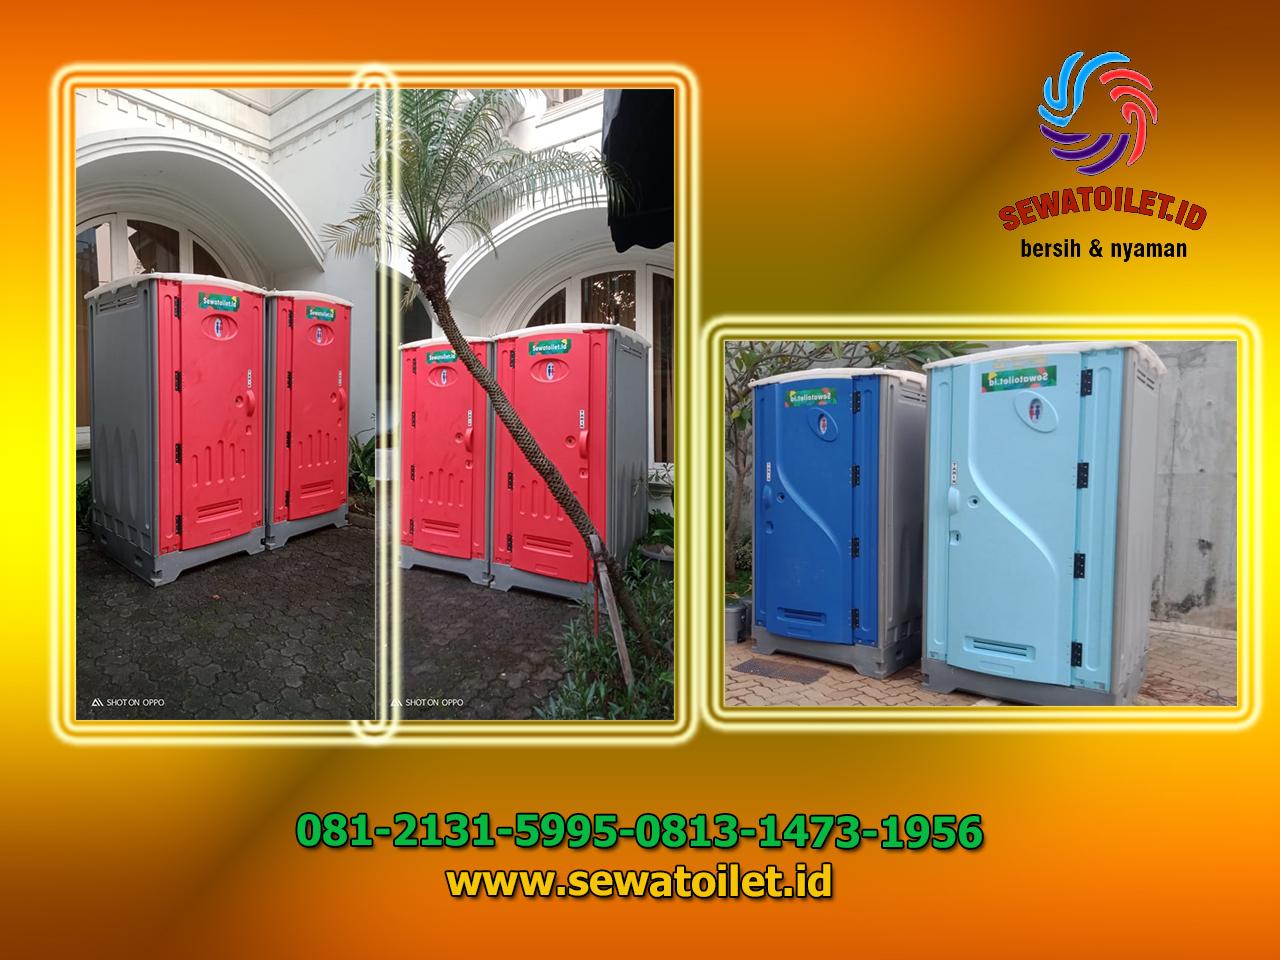 Sewa WC atau Toilet Portable di Kebon Sirih 2 Jakarta